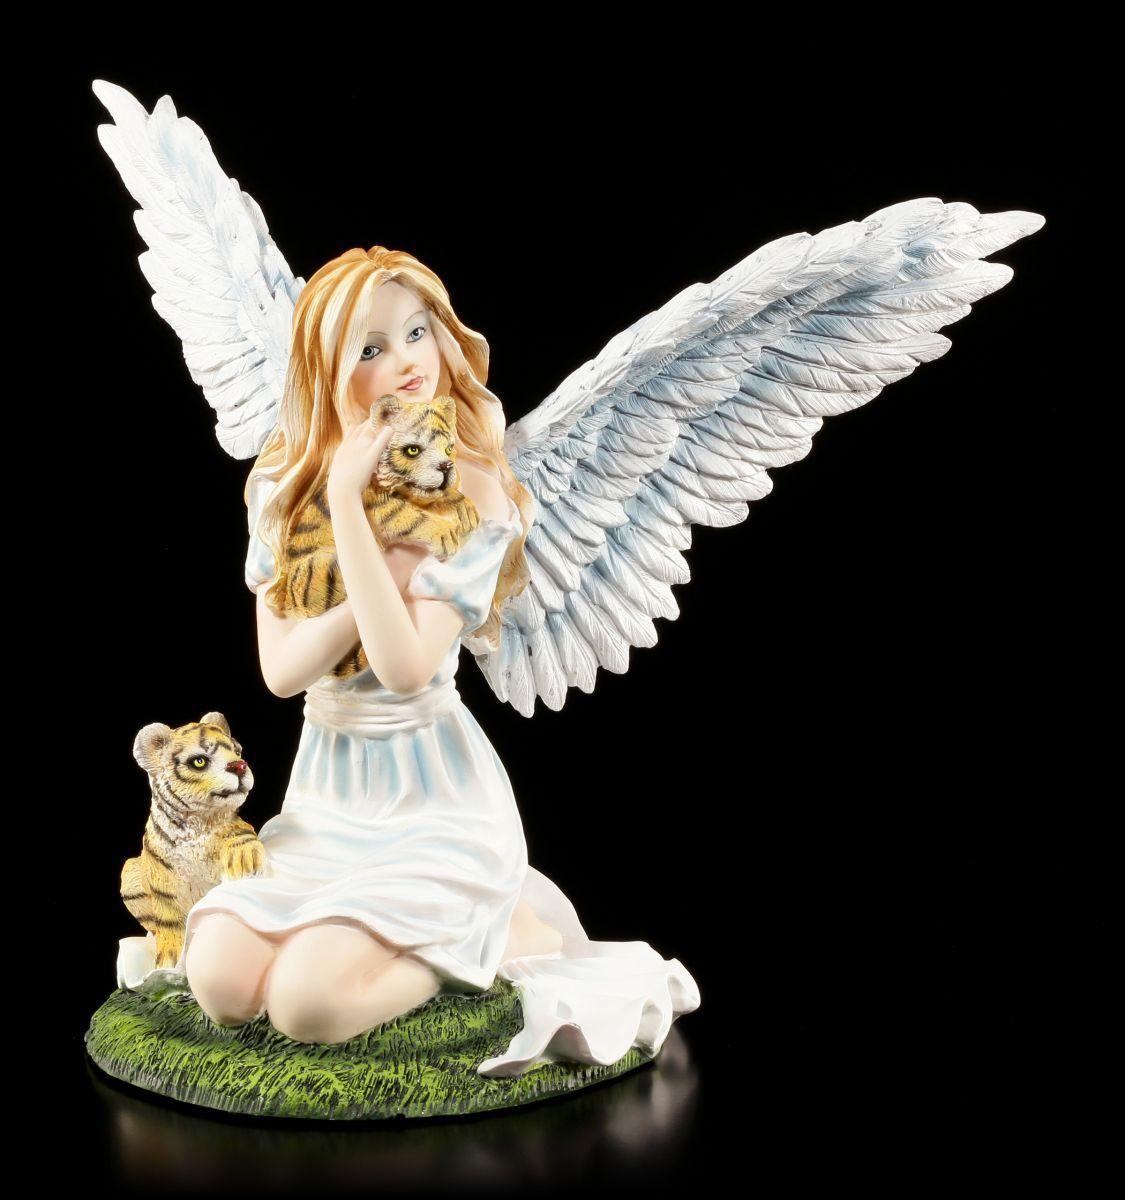 Cute statue angel with tiger- s-fantasy fairy elf statue deco